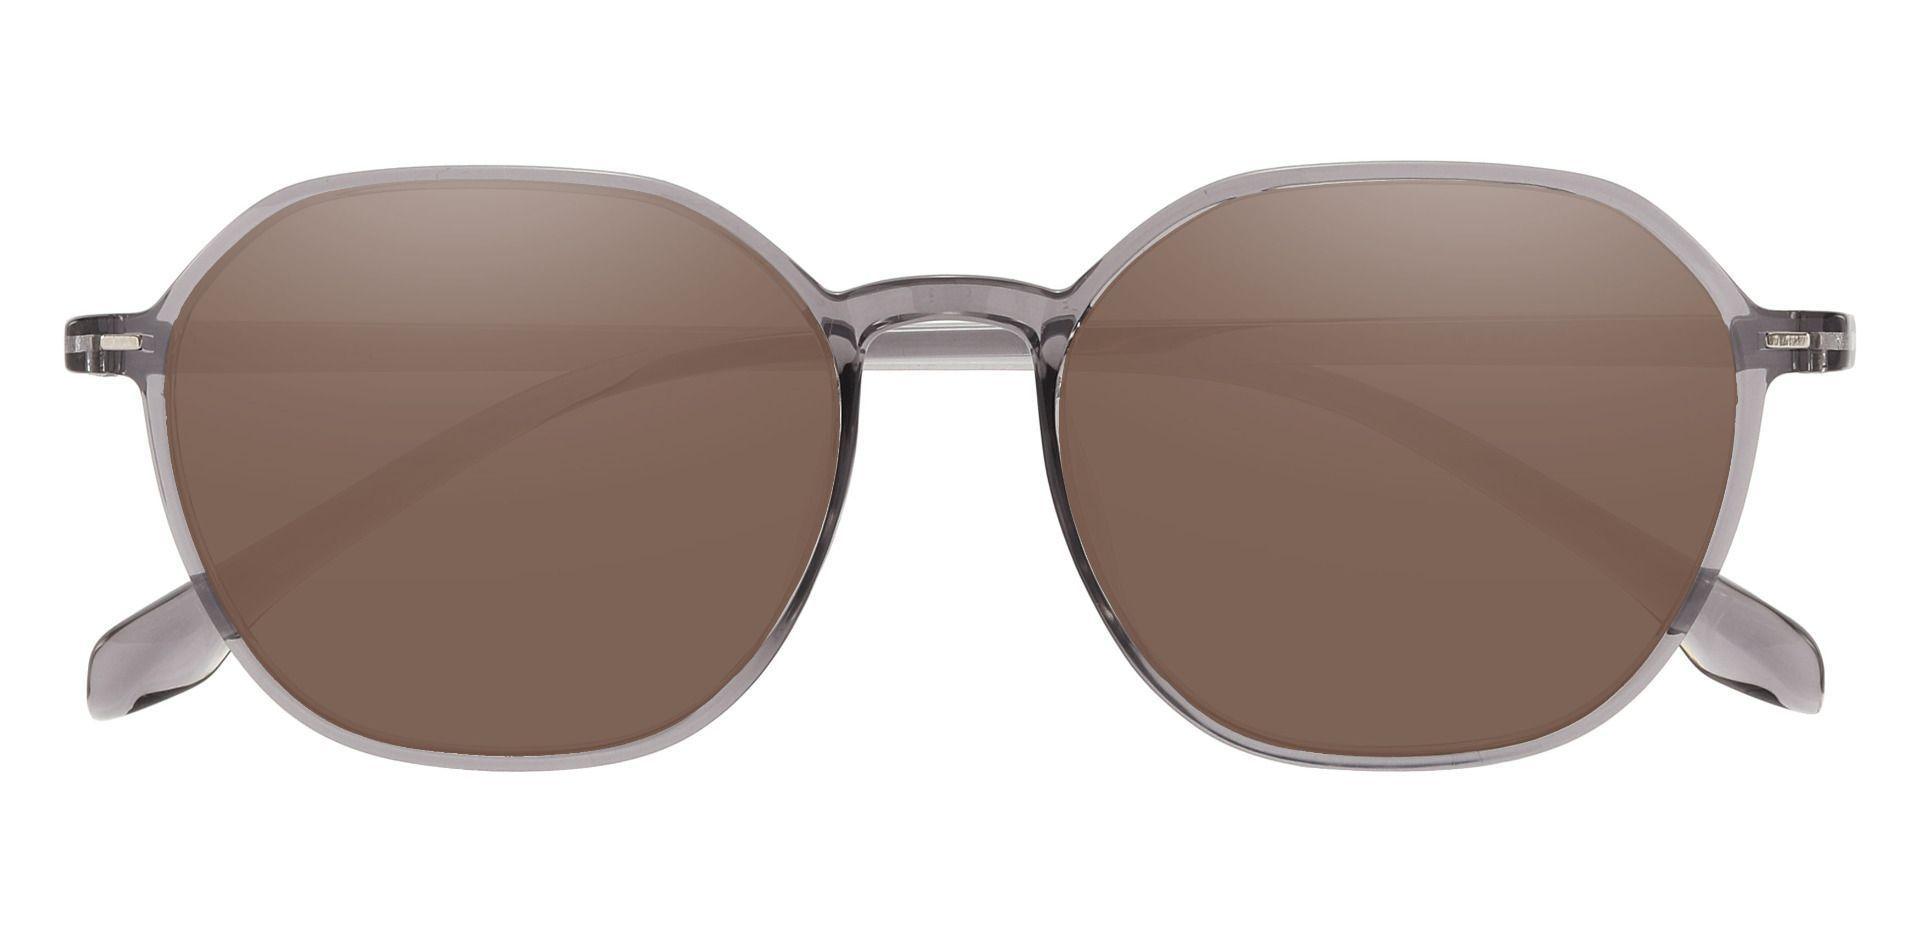 Detroit Geometric Prescription Sunglasses - Gray Frame With Brown Lenses